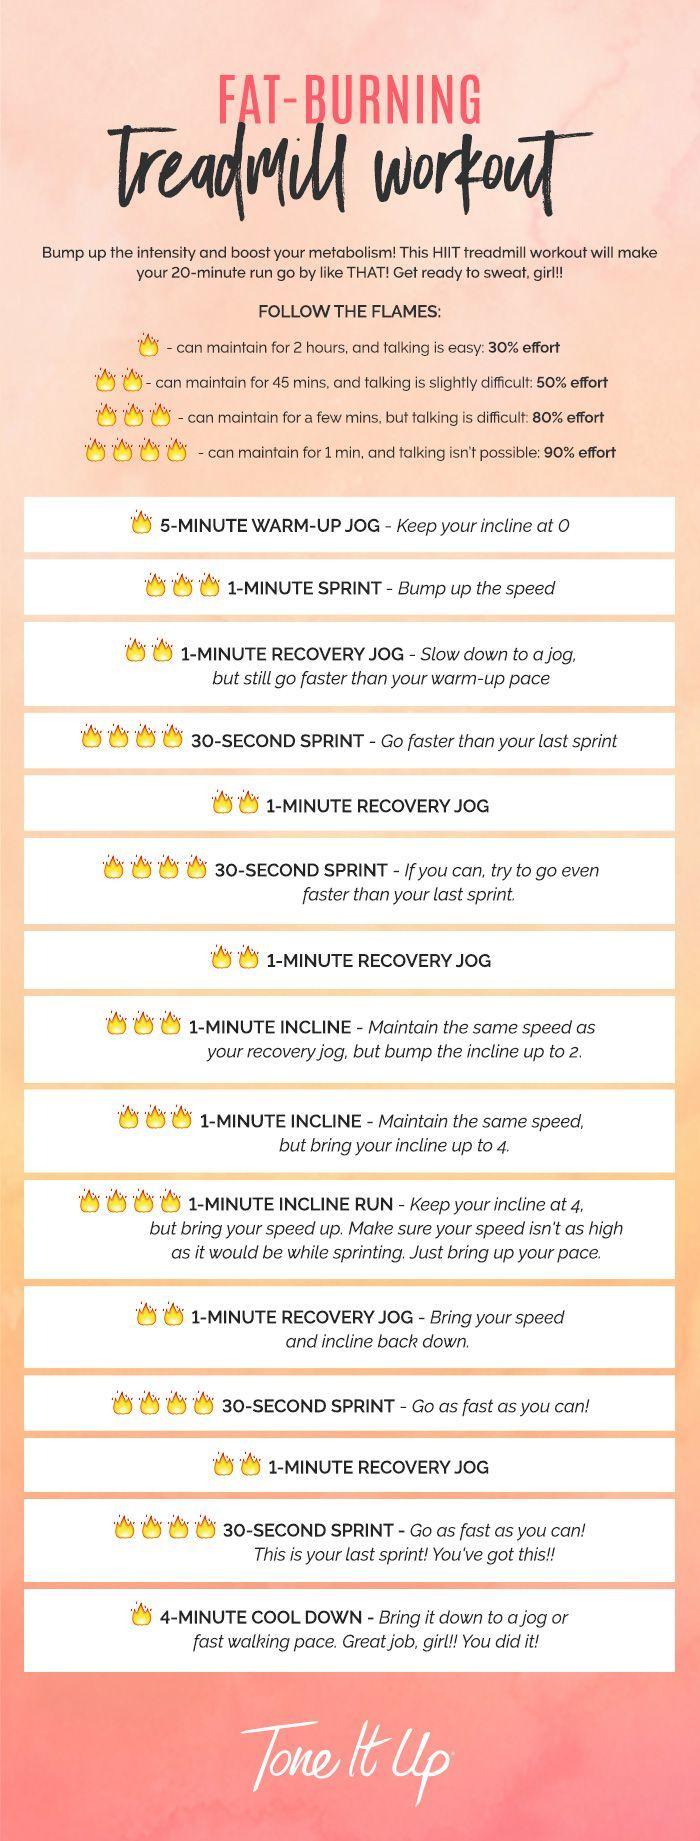 NEW Metabolism-Boosting, Fat-Burning Treadmill Workout